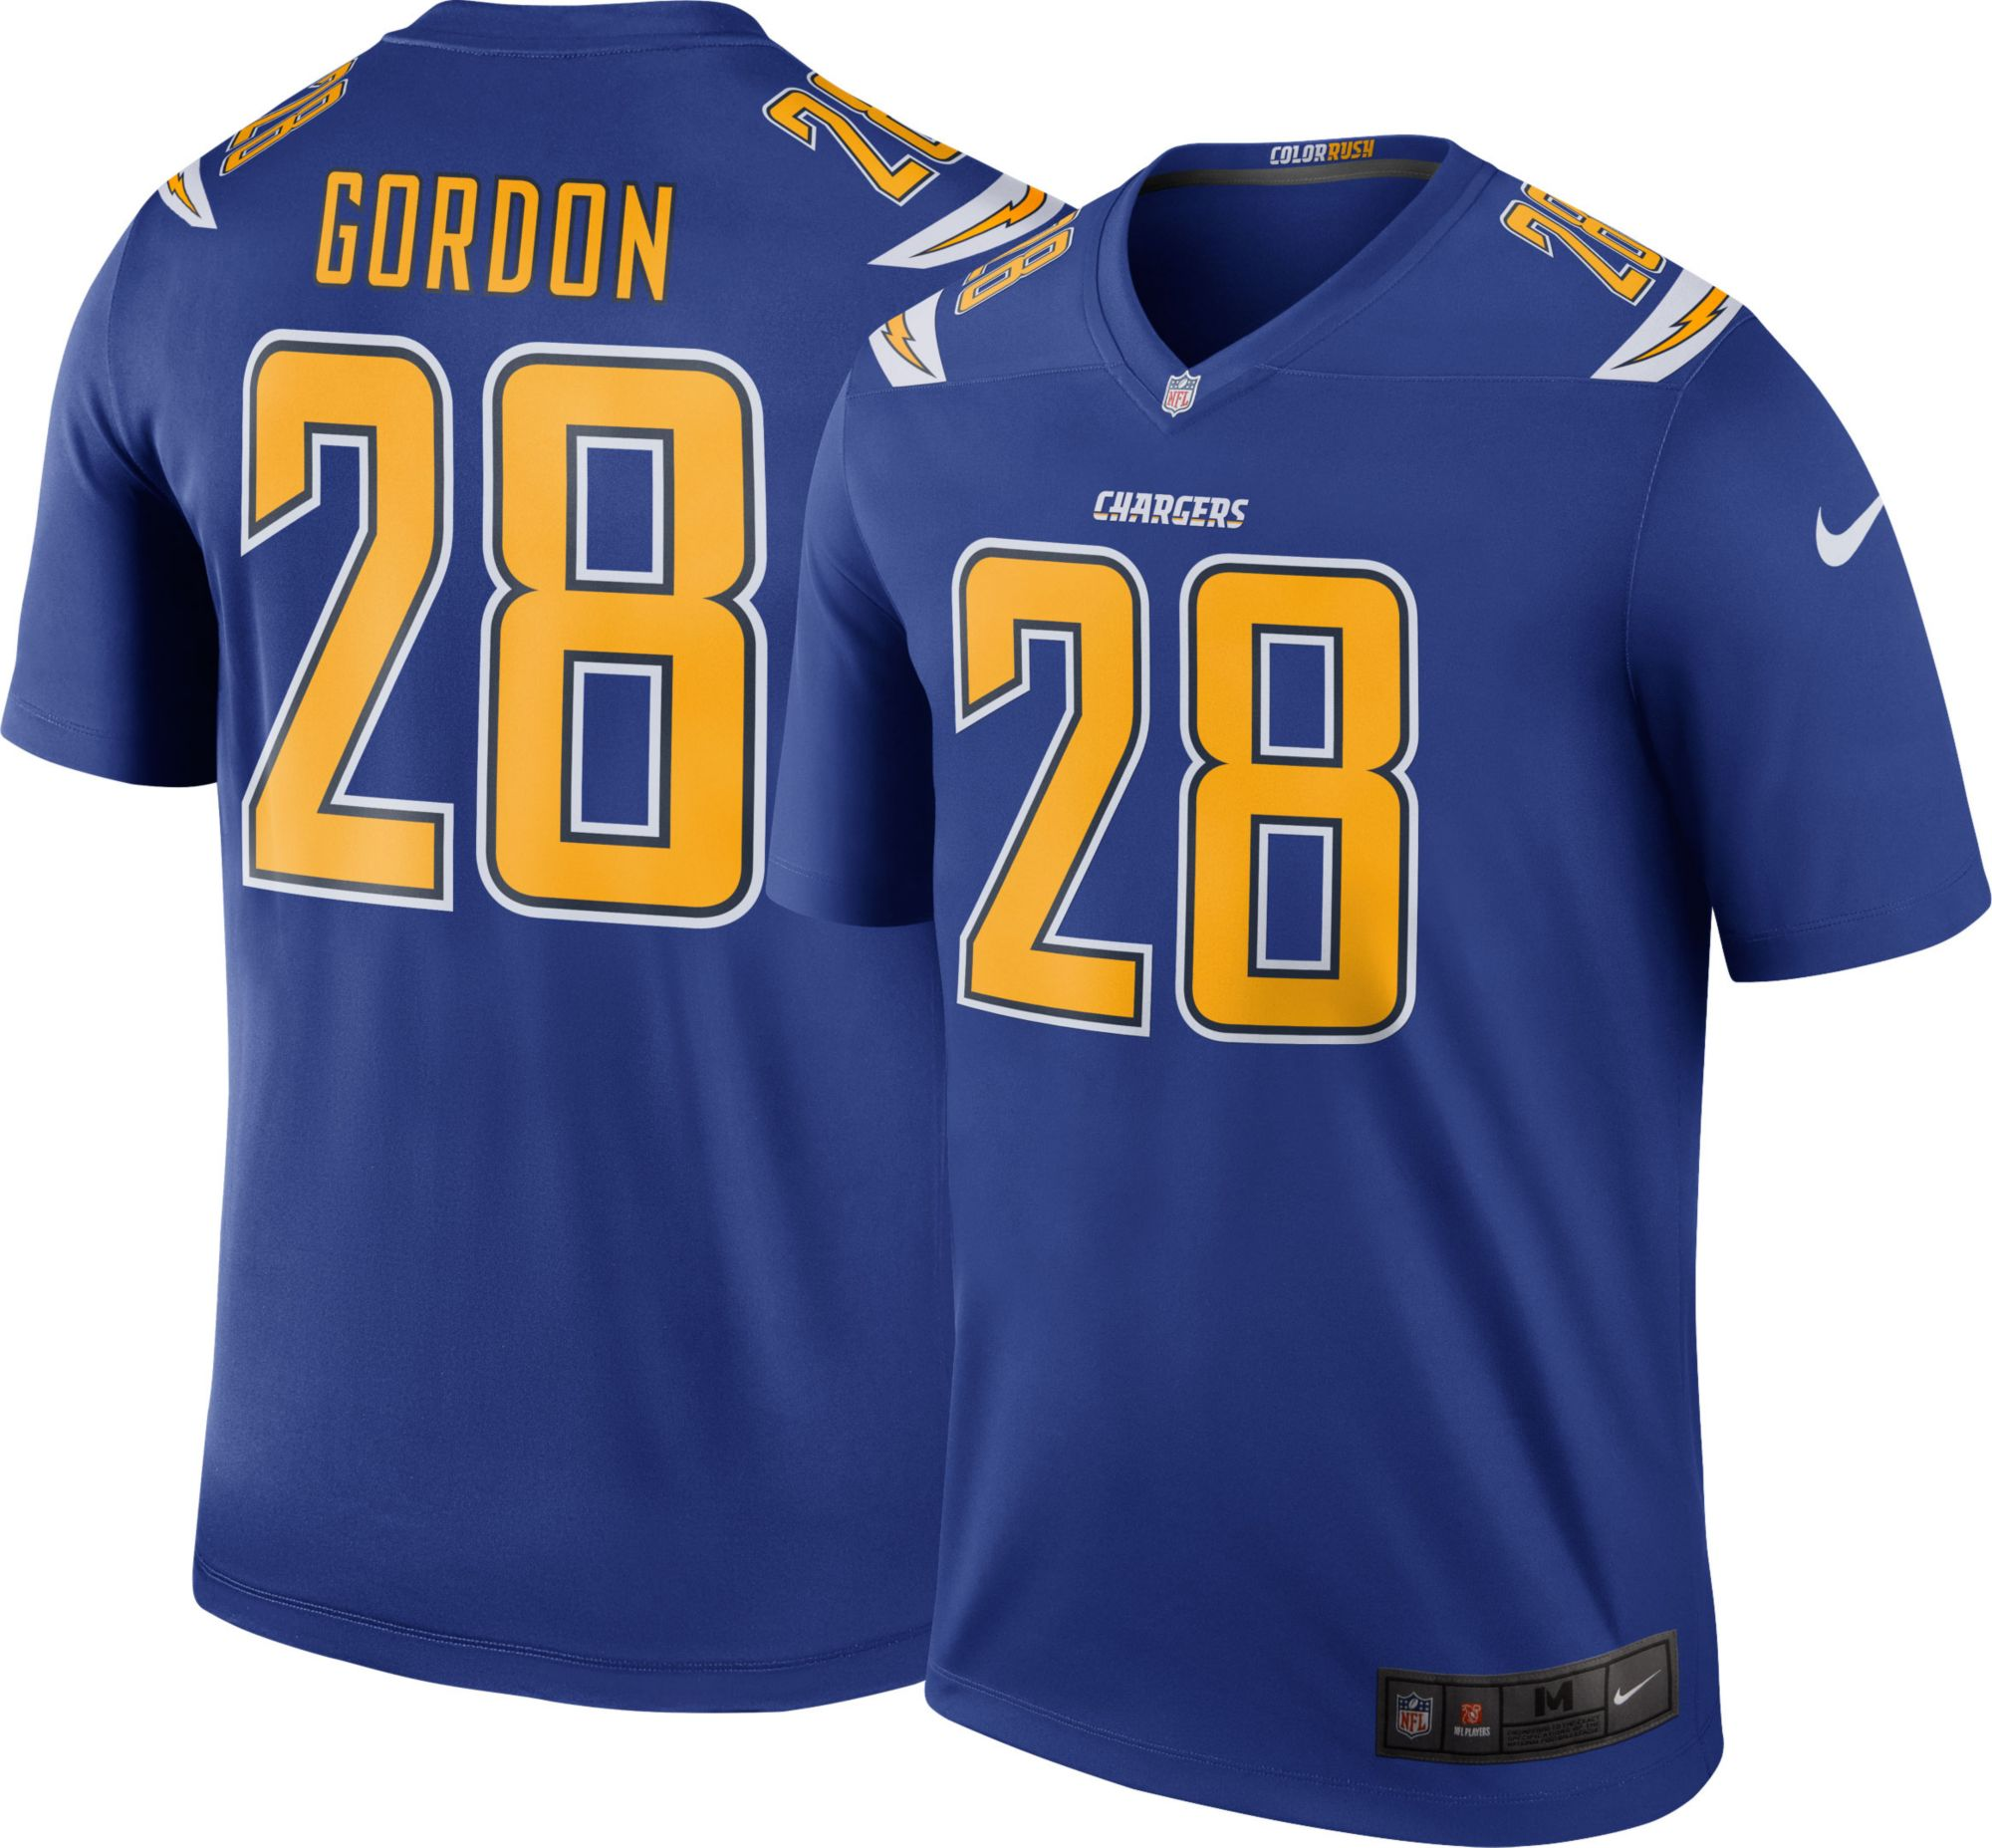 200f3e4c Nike Men's Color Rush Legend Jersey Los Angeles Chargers Melvin ...